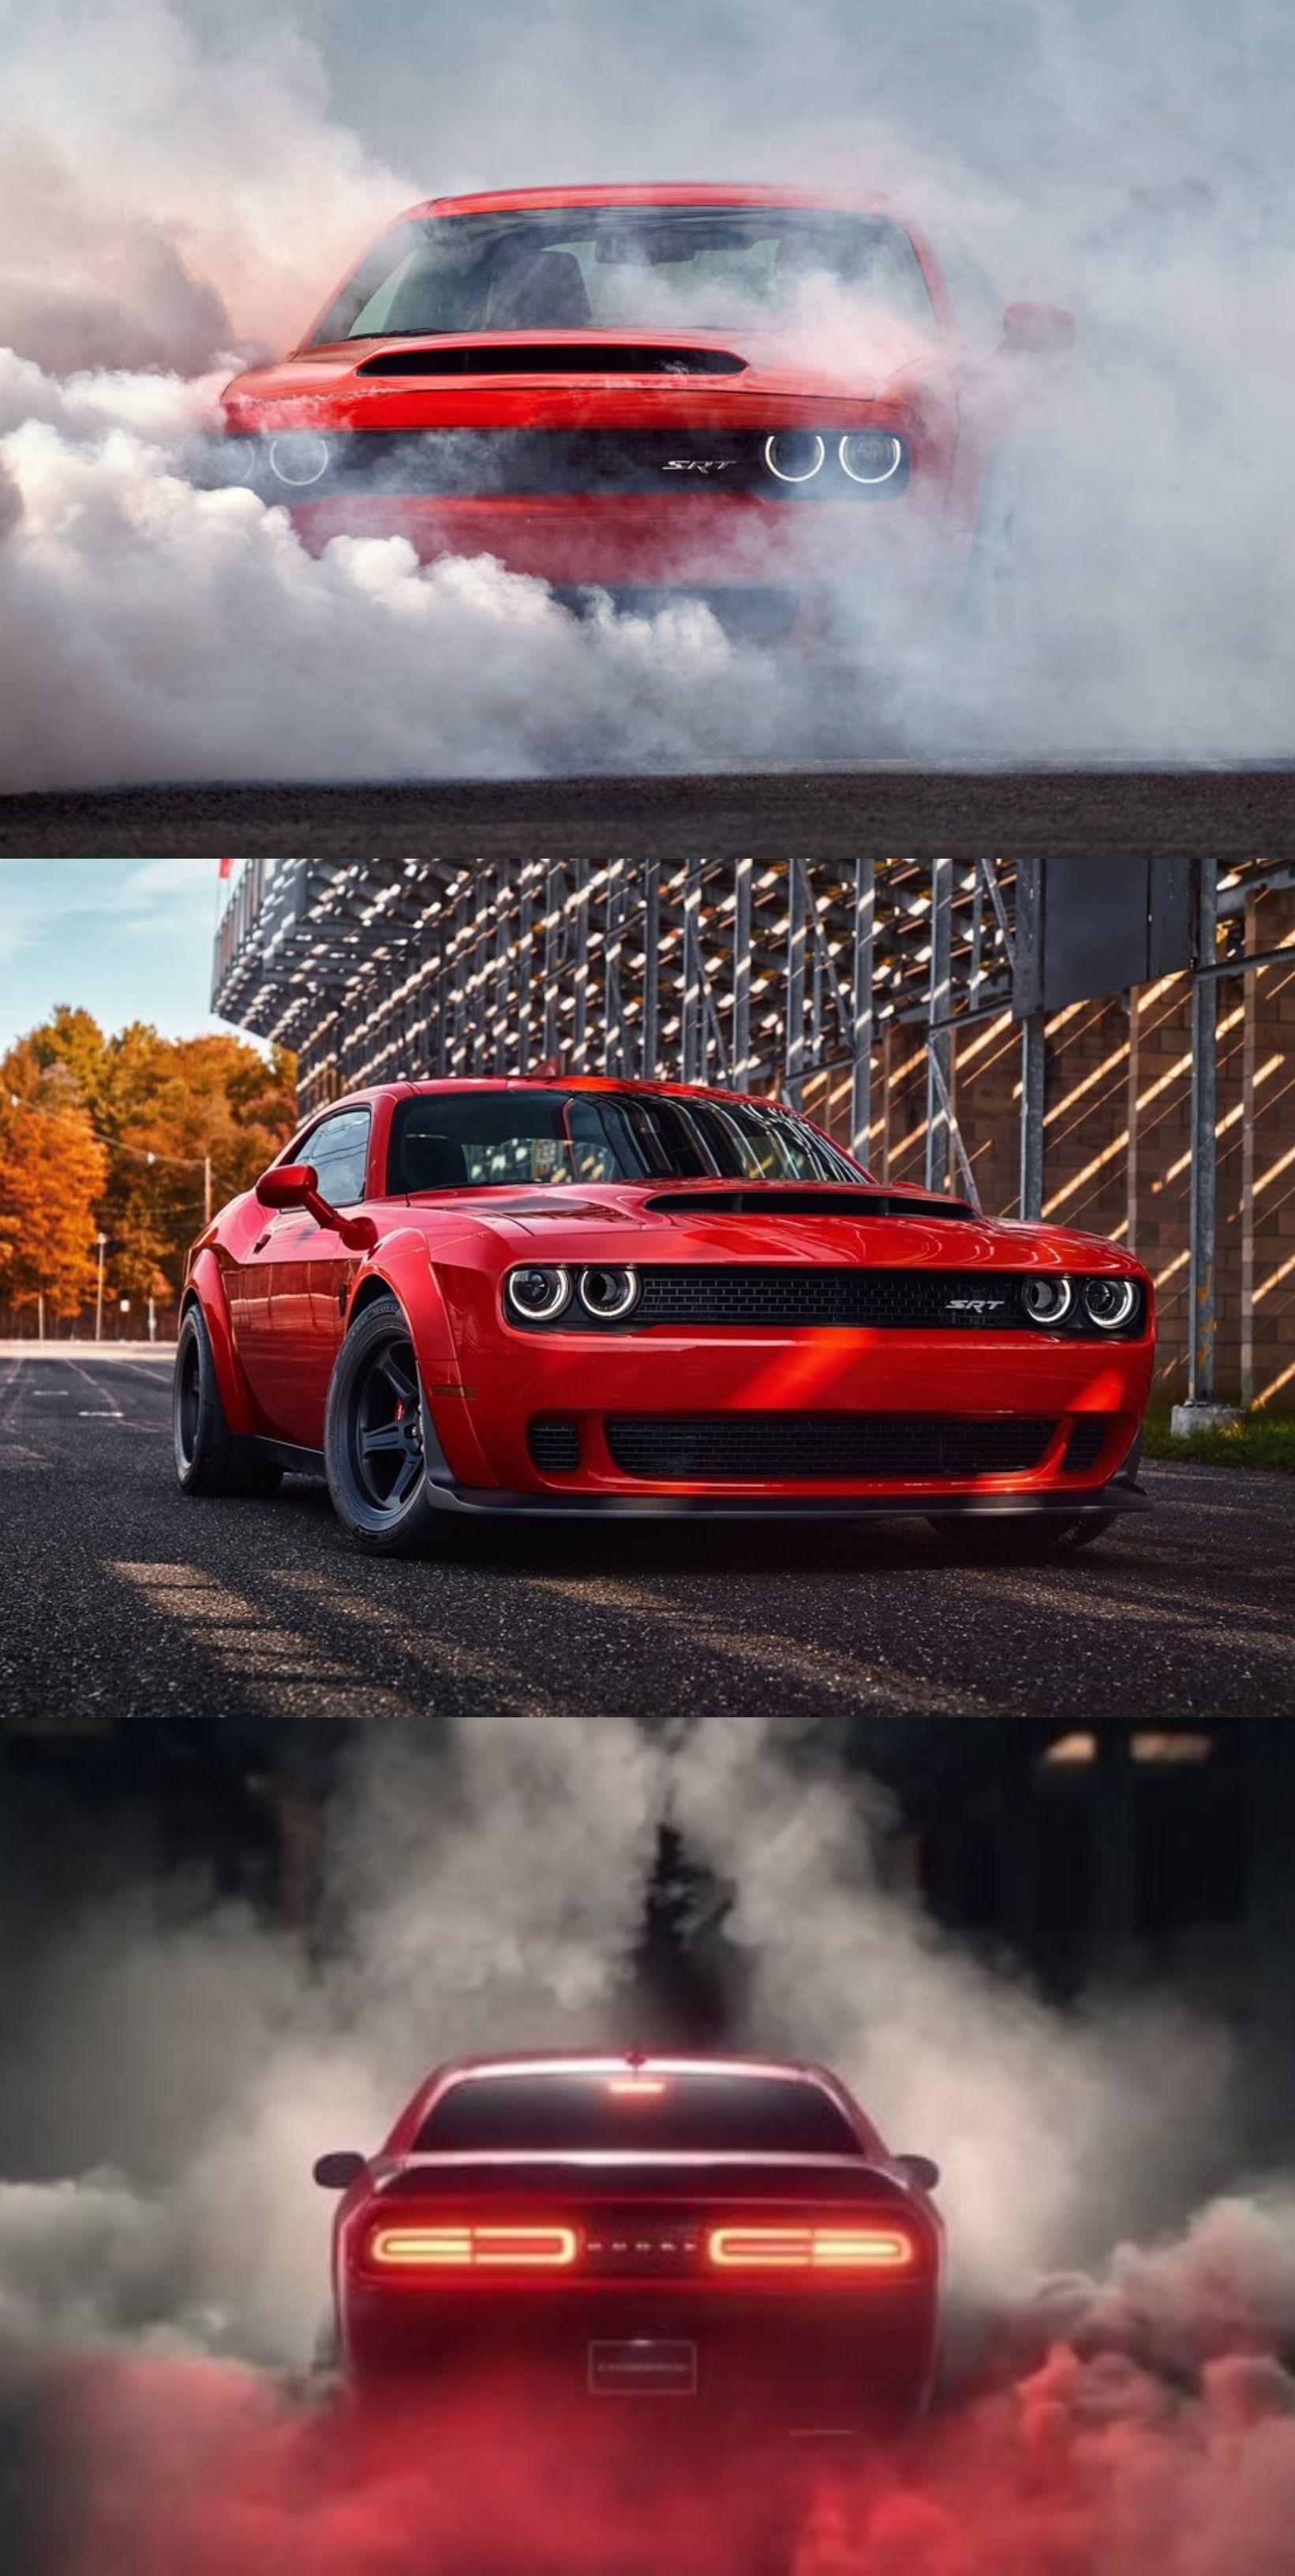 Dodge Challenger Srt Demon Burnout Compilation Musclecars Dodgedemon Dodgechallenger Muscle Cars Classic Cars Dodge